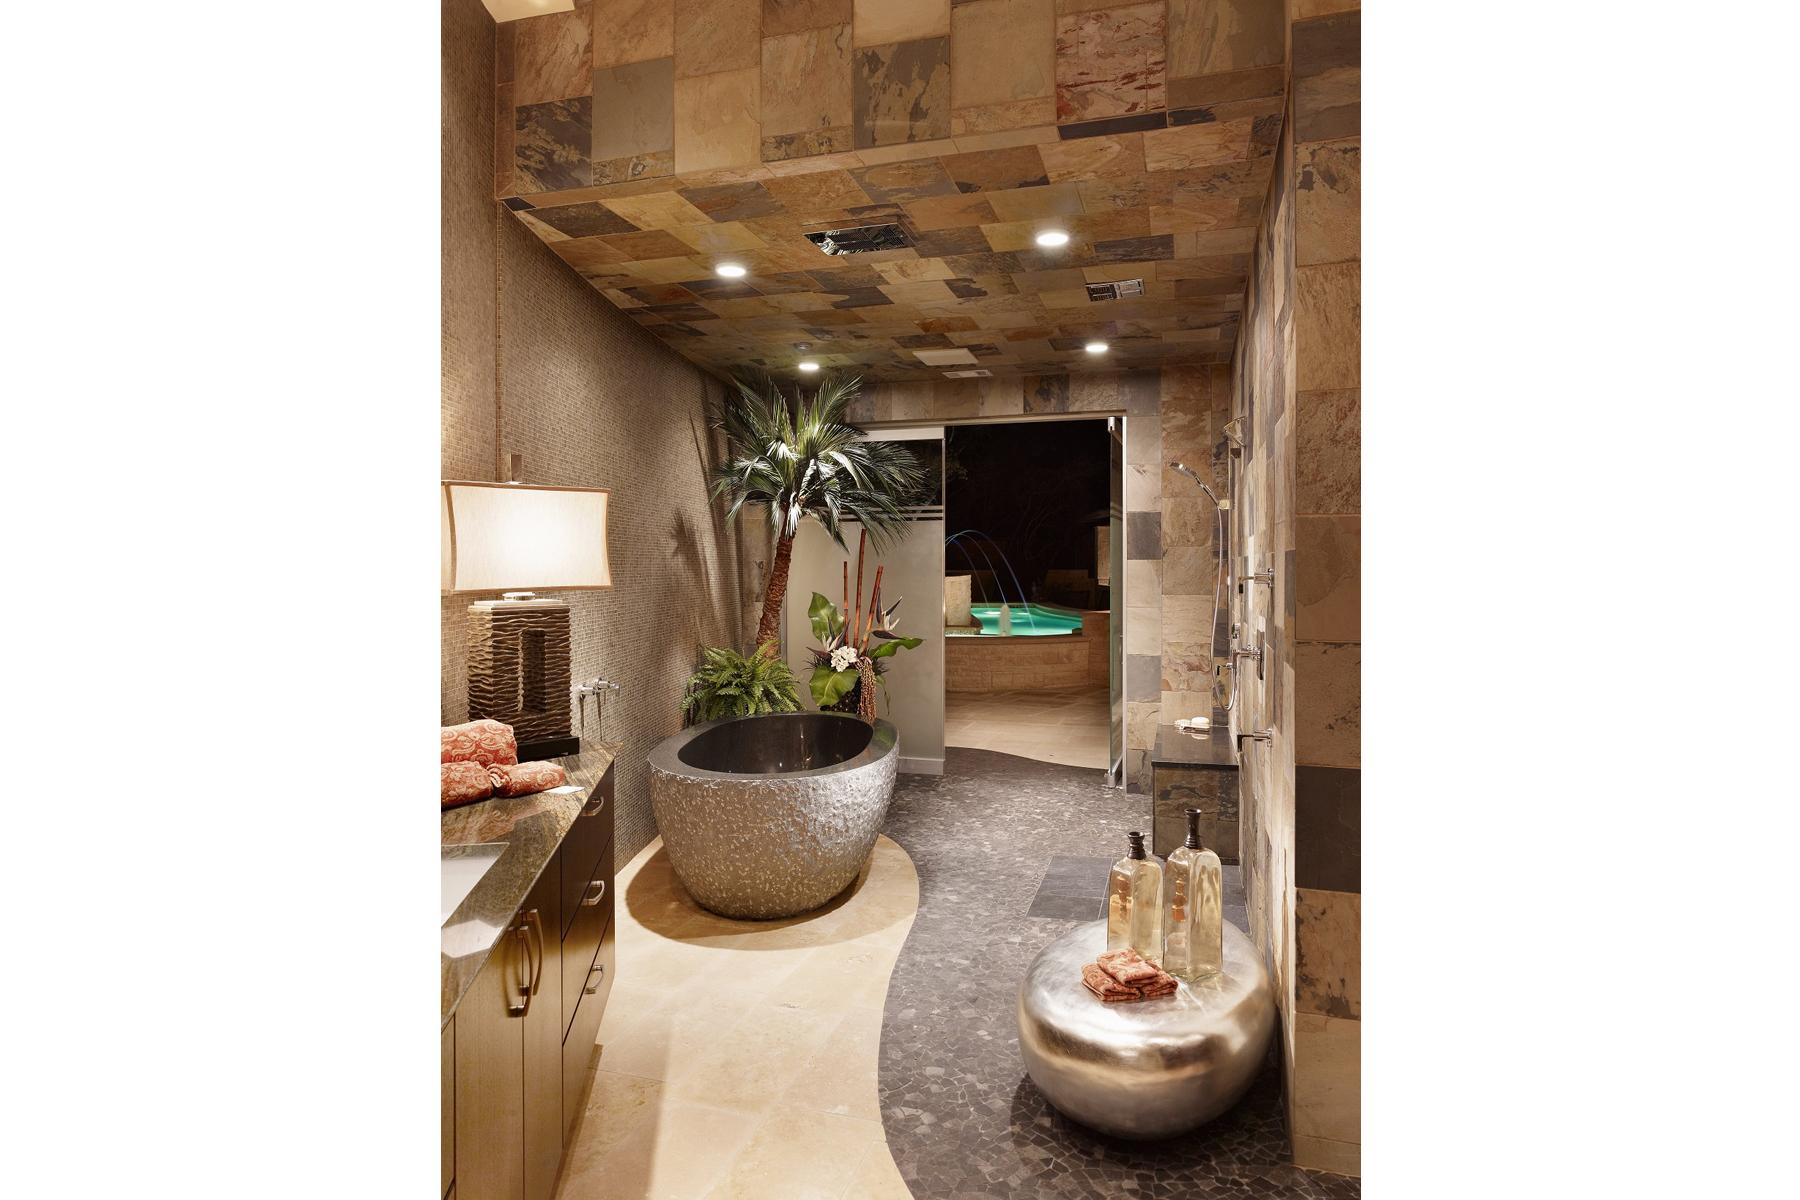 spanish-oaks-bathroom